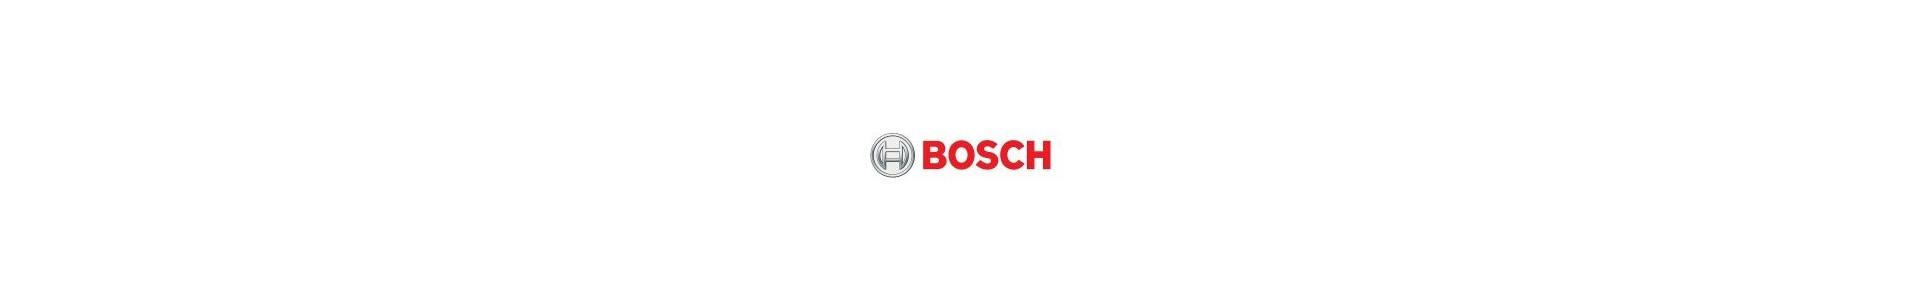 Injecteur common rail Bosch InjecteurDiscount